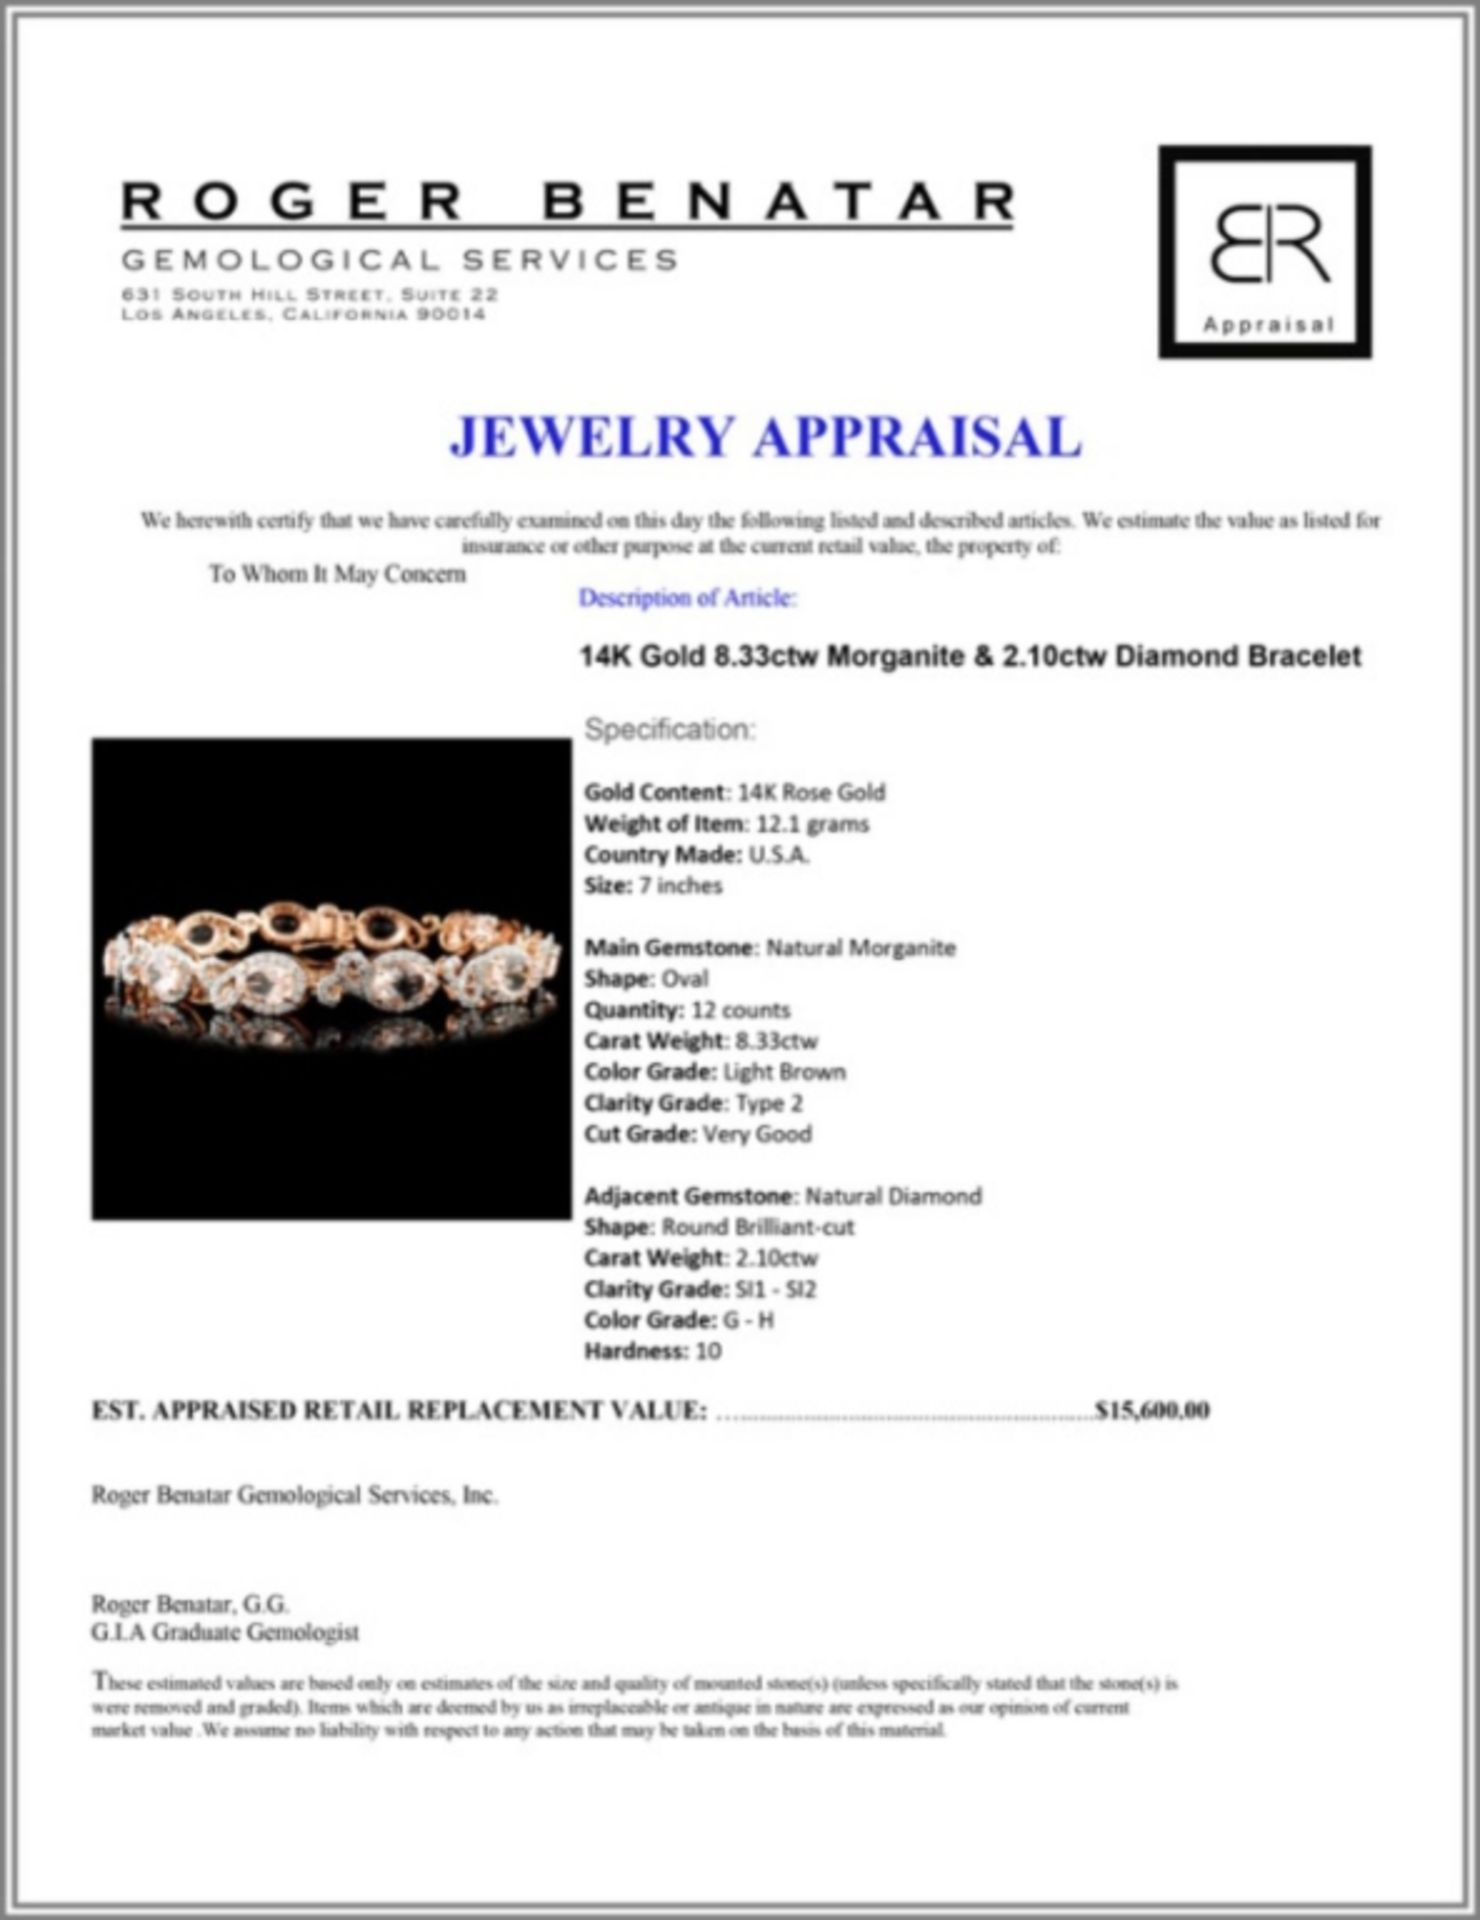 14K Gold 8.33ctw Morganite & 2.10ctw Diamond Brace - Image 3 of 3